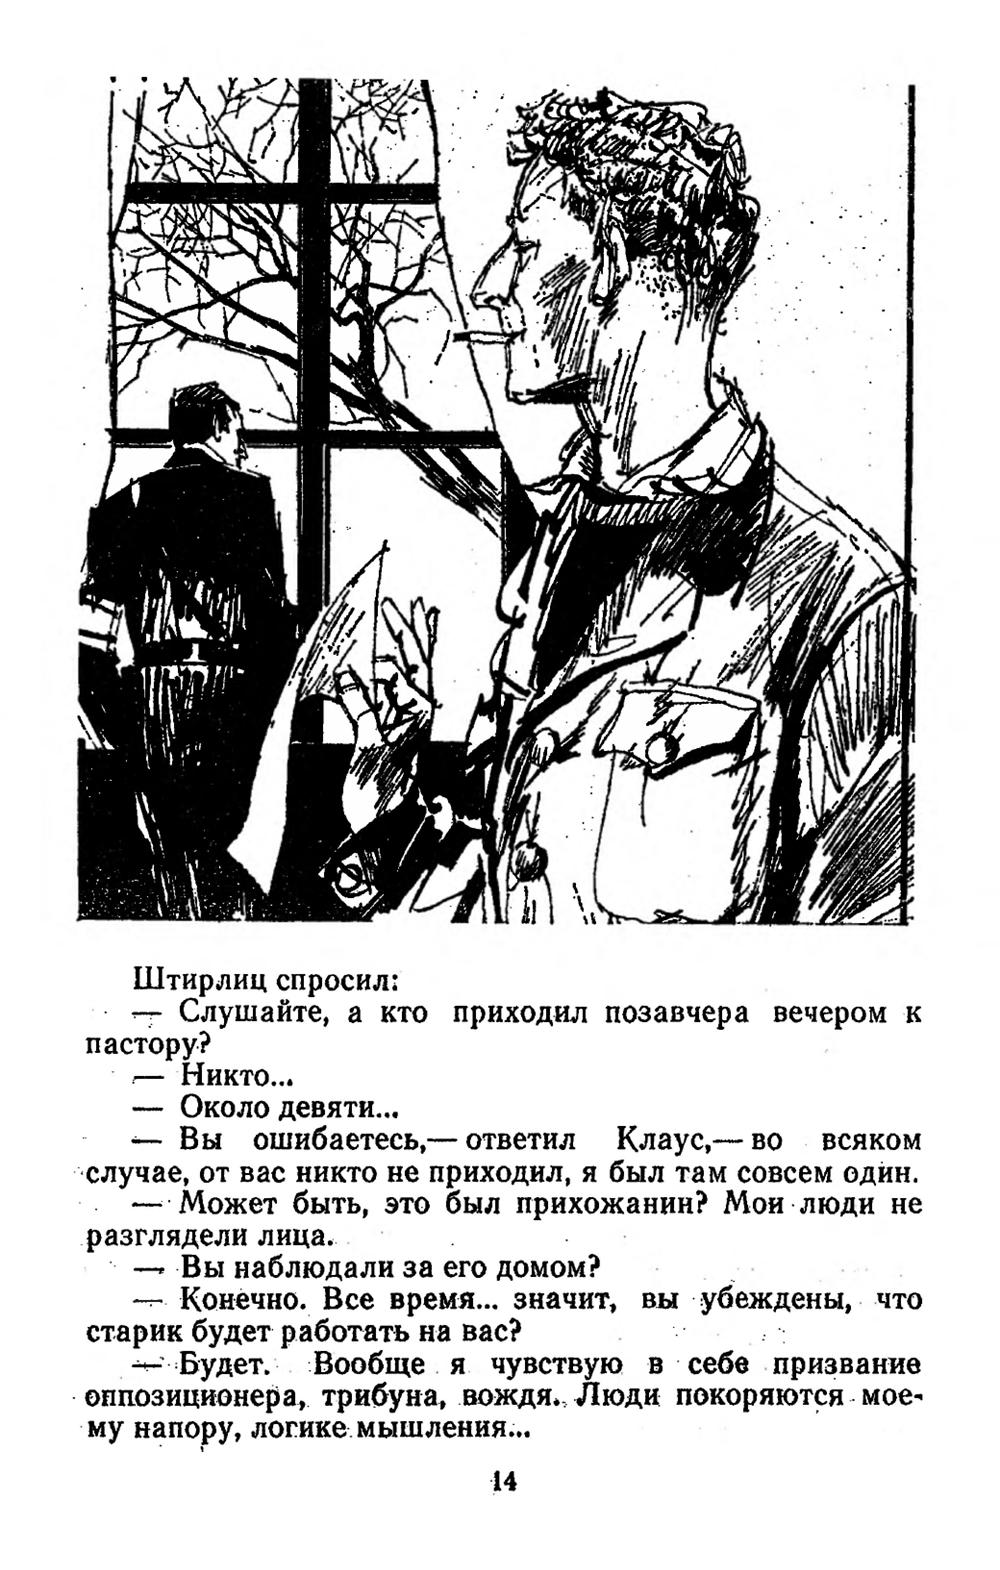 http://images.vfl.ru/ii/1405769386/b549bbde/5748937.jpg